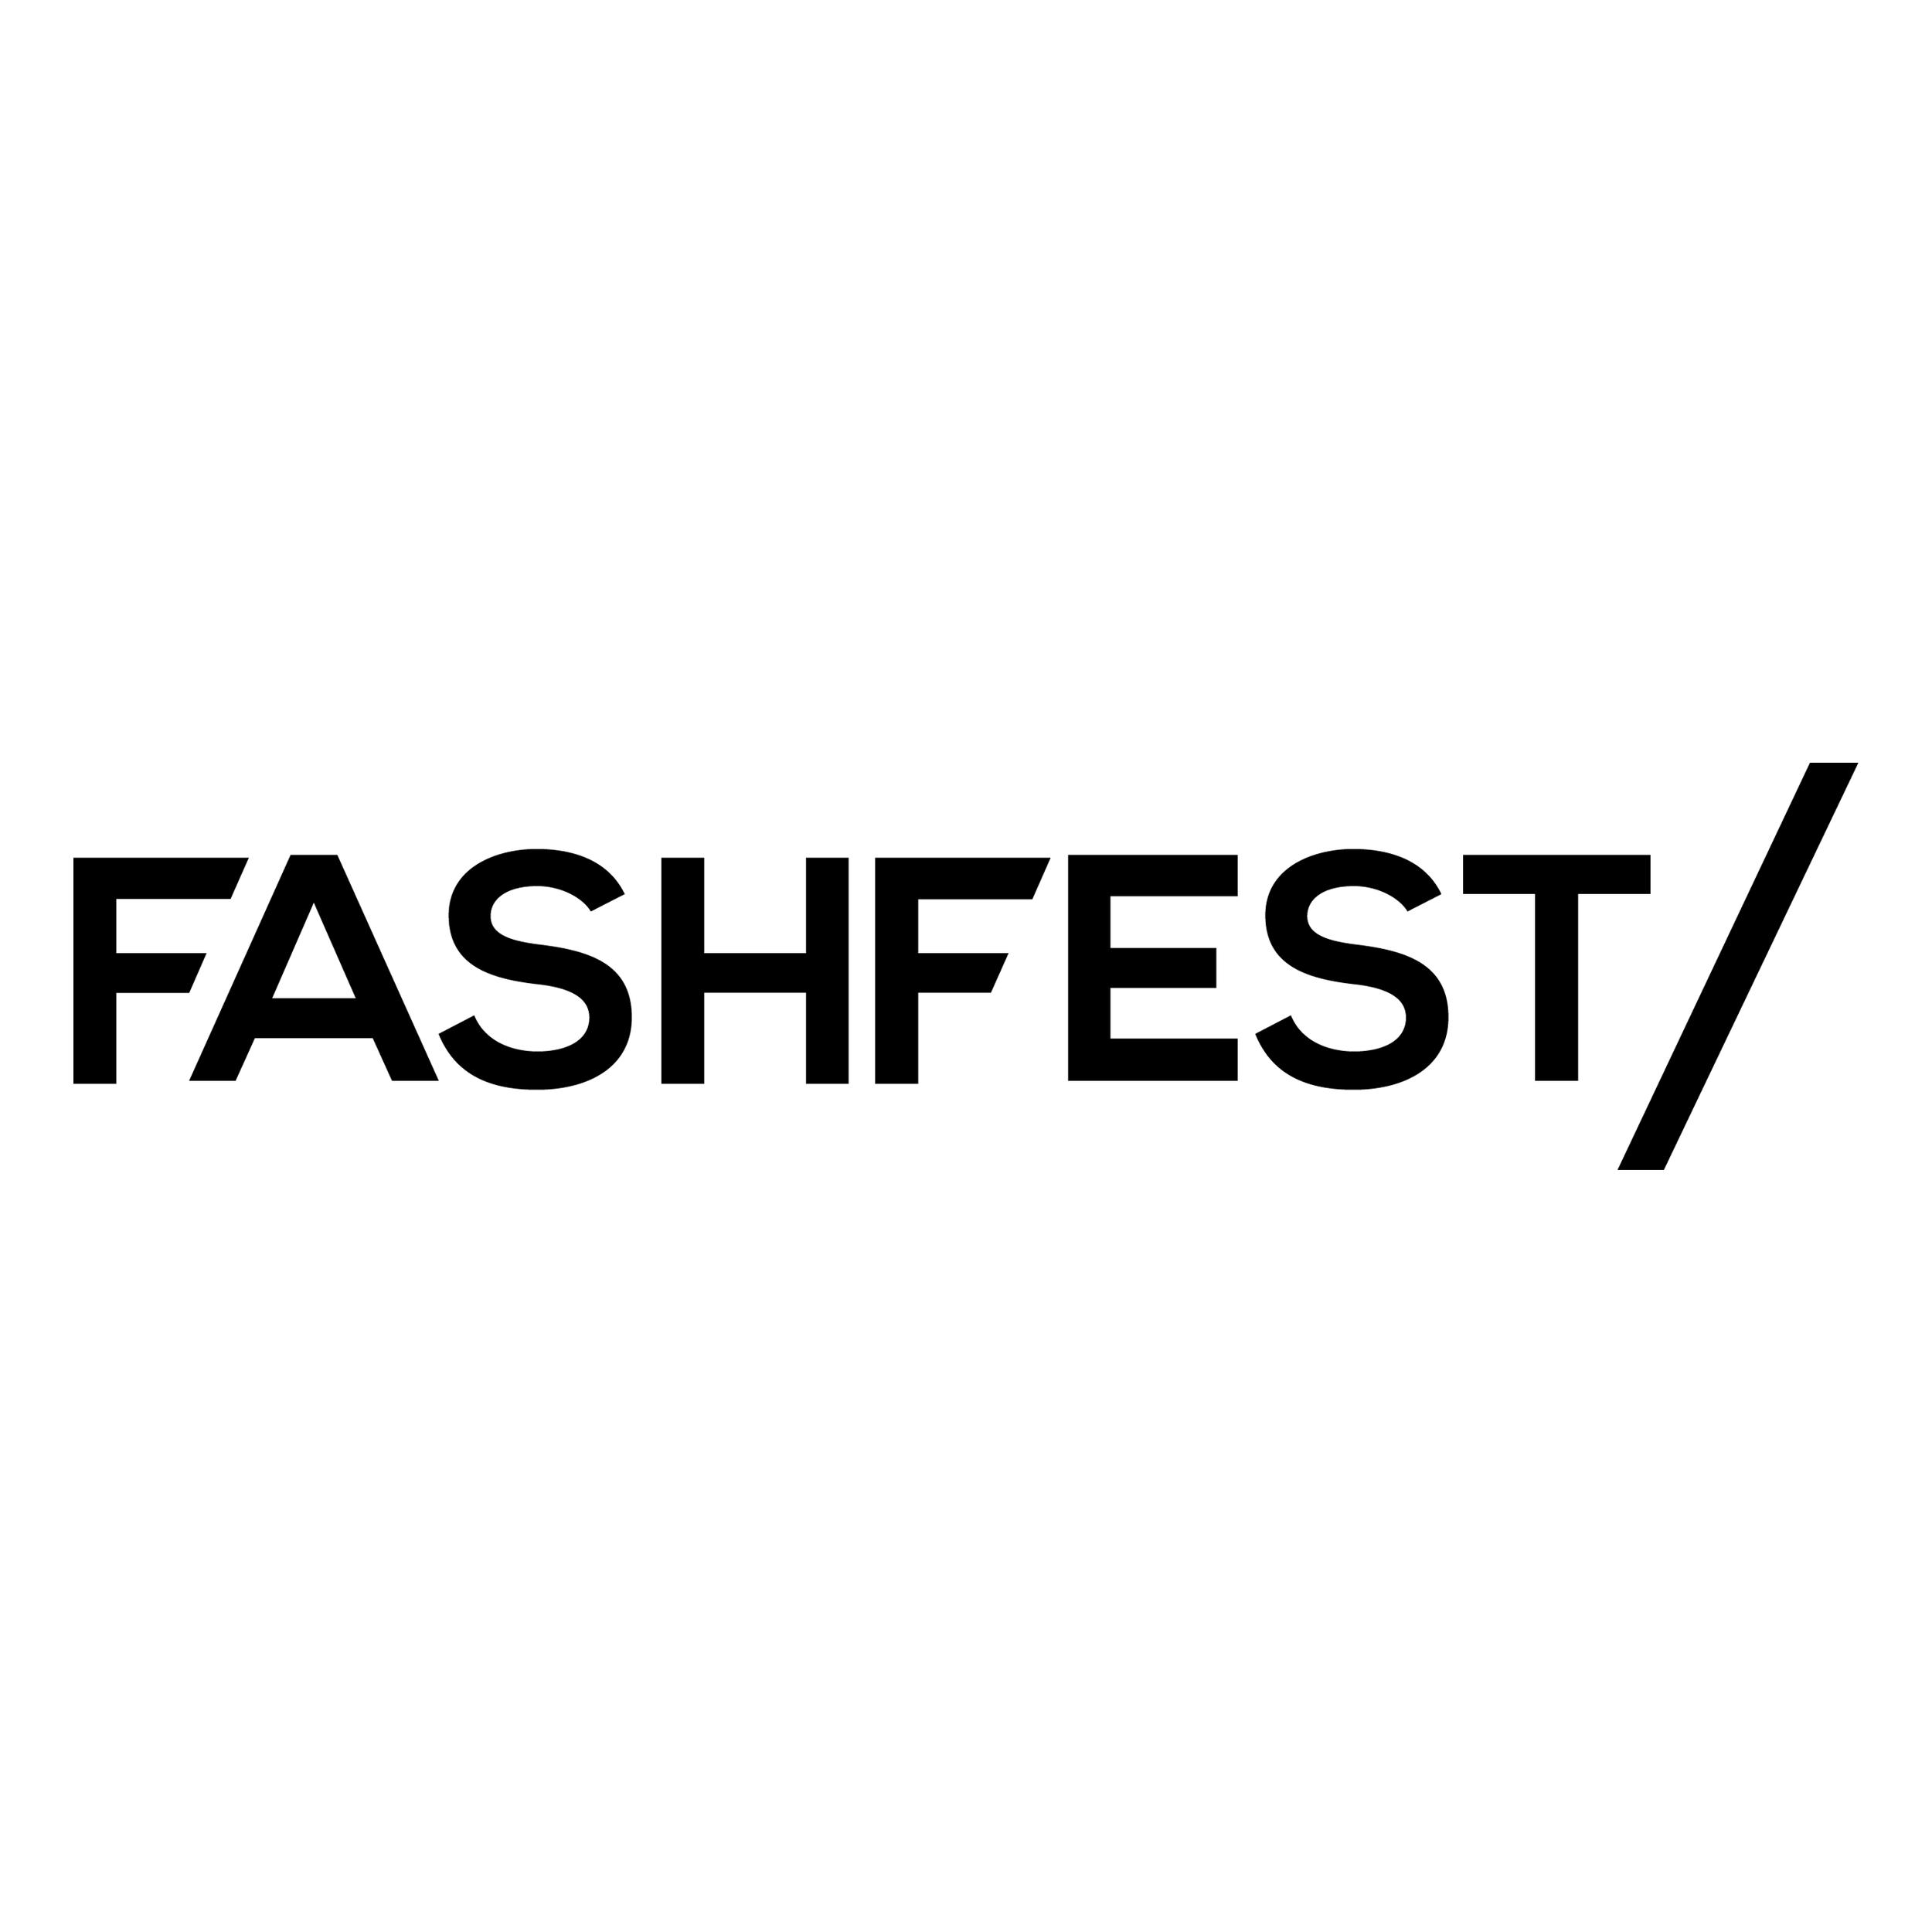 FASHFEST.png